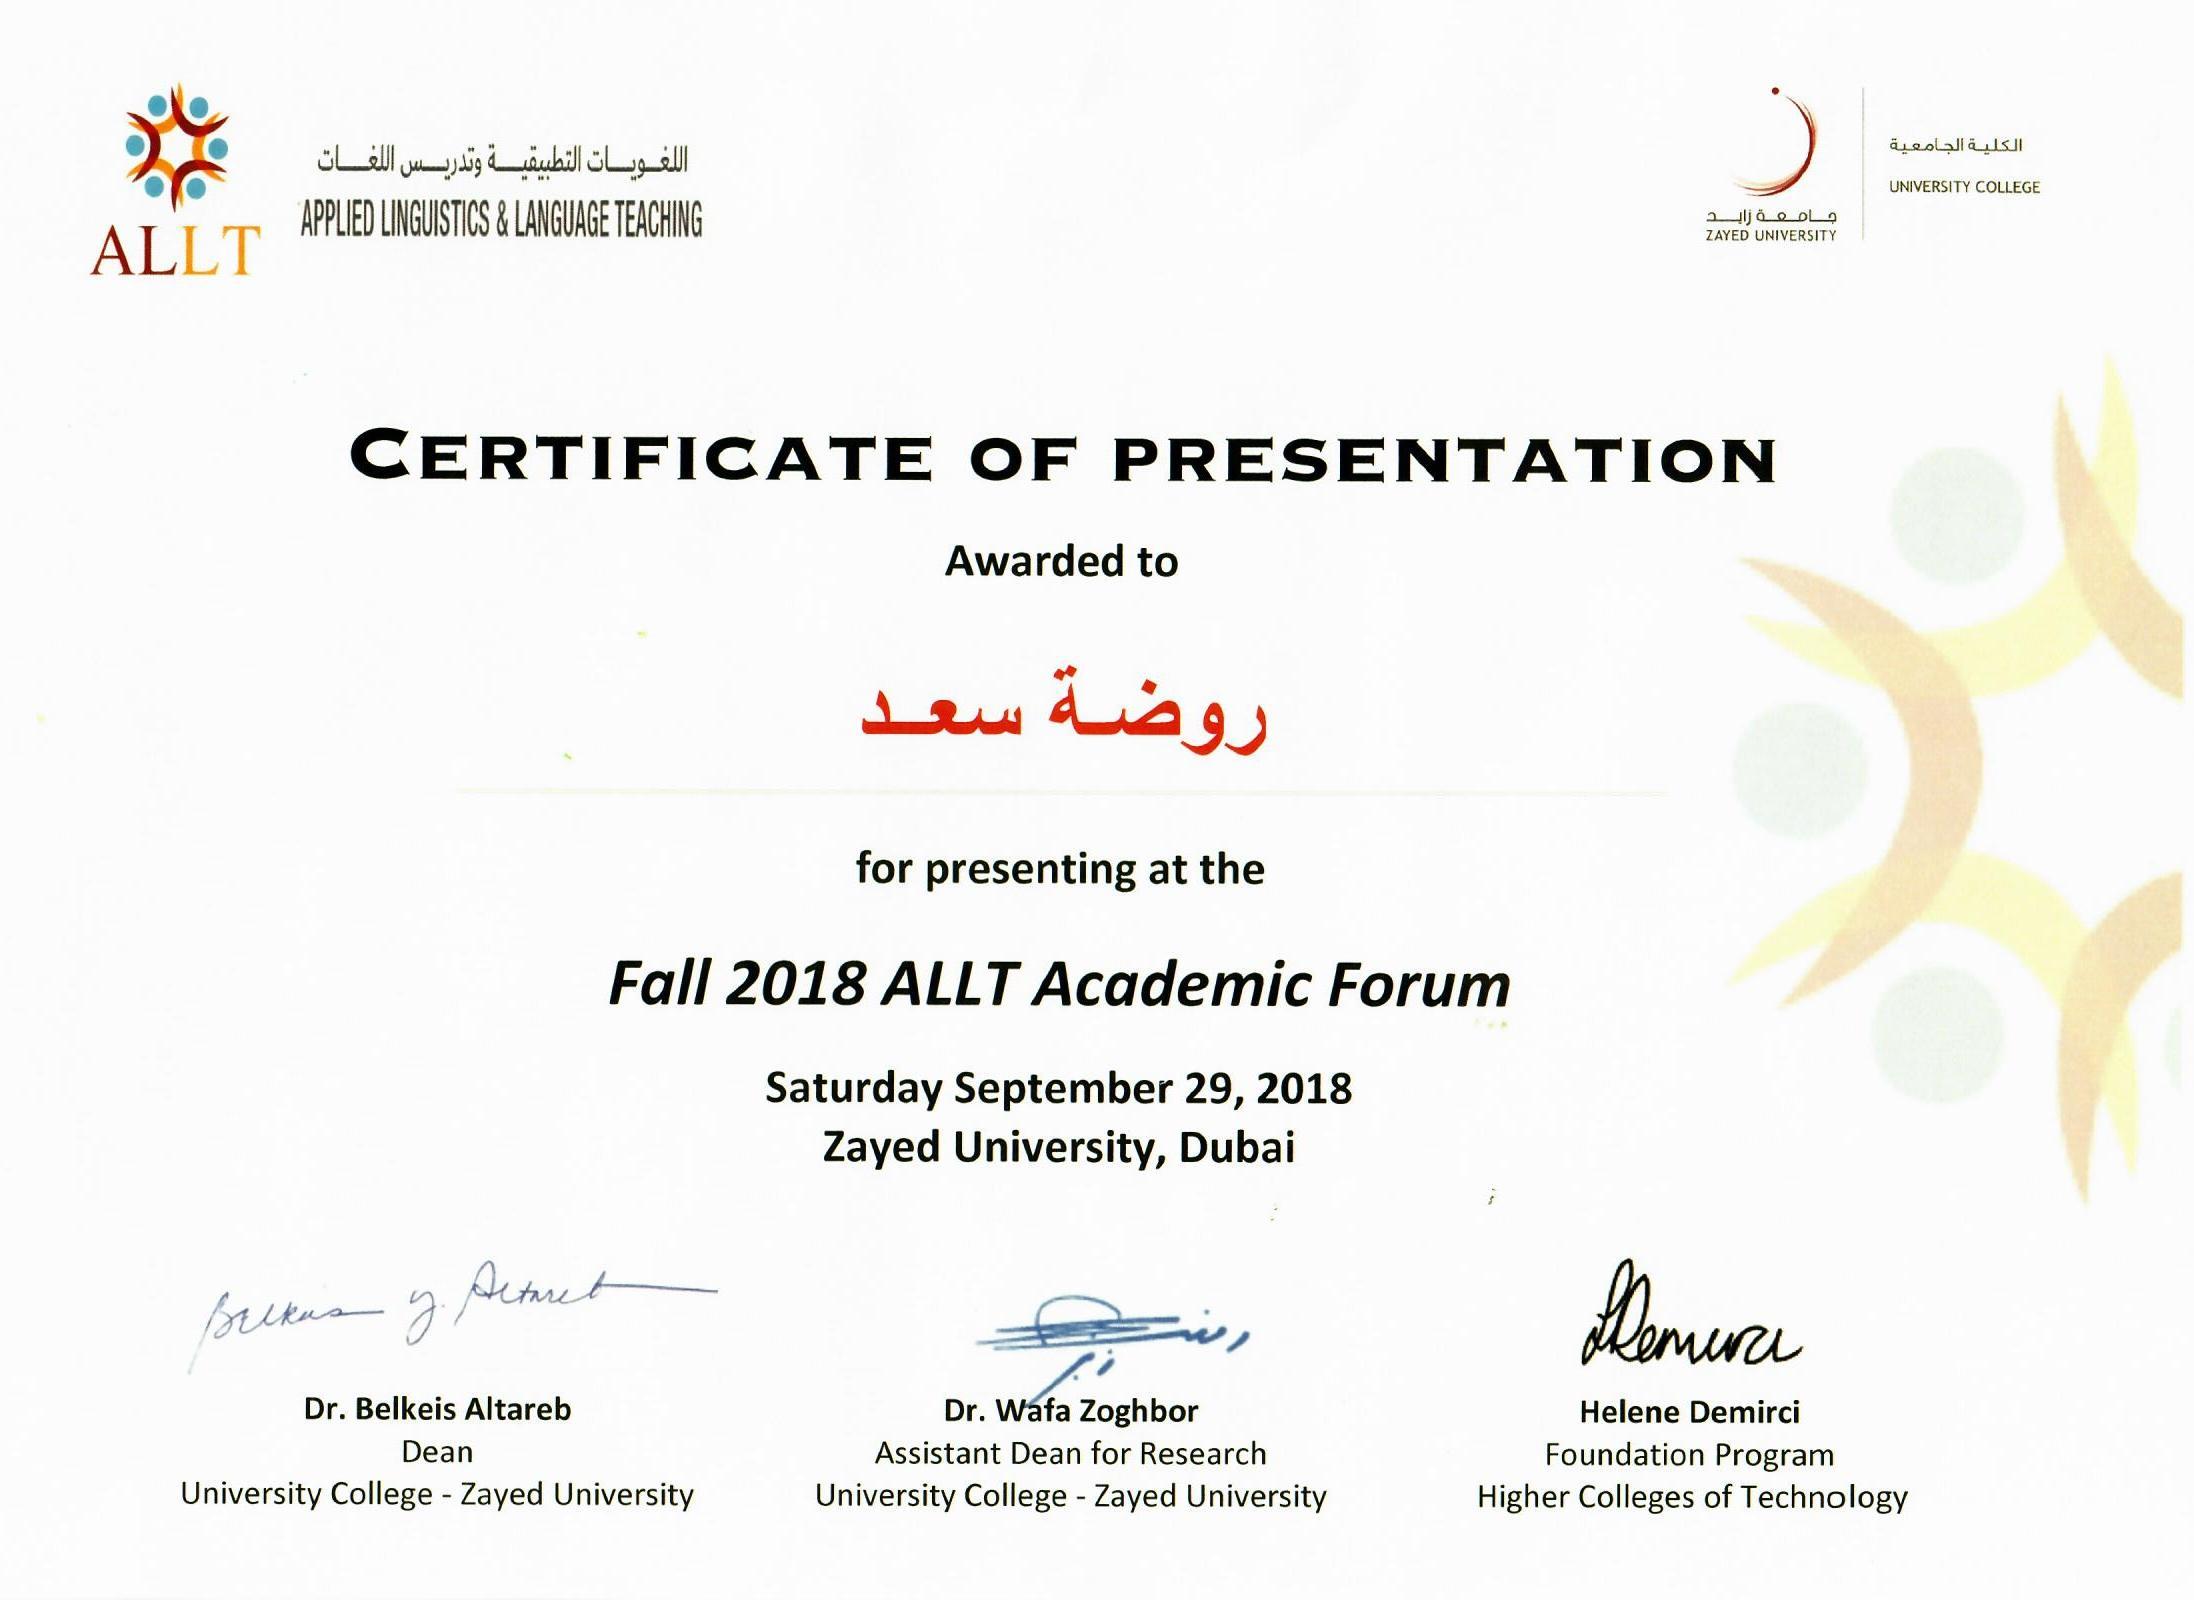 #Zayed University - @روضة _سعد